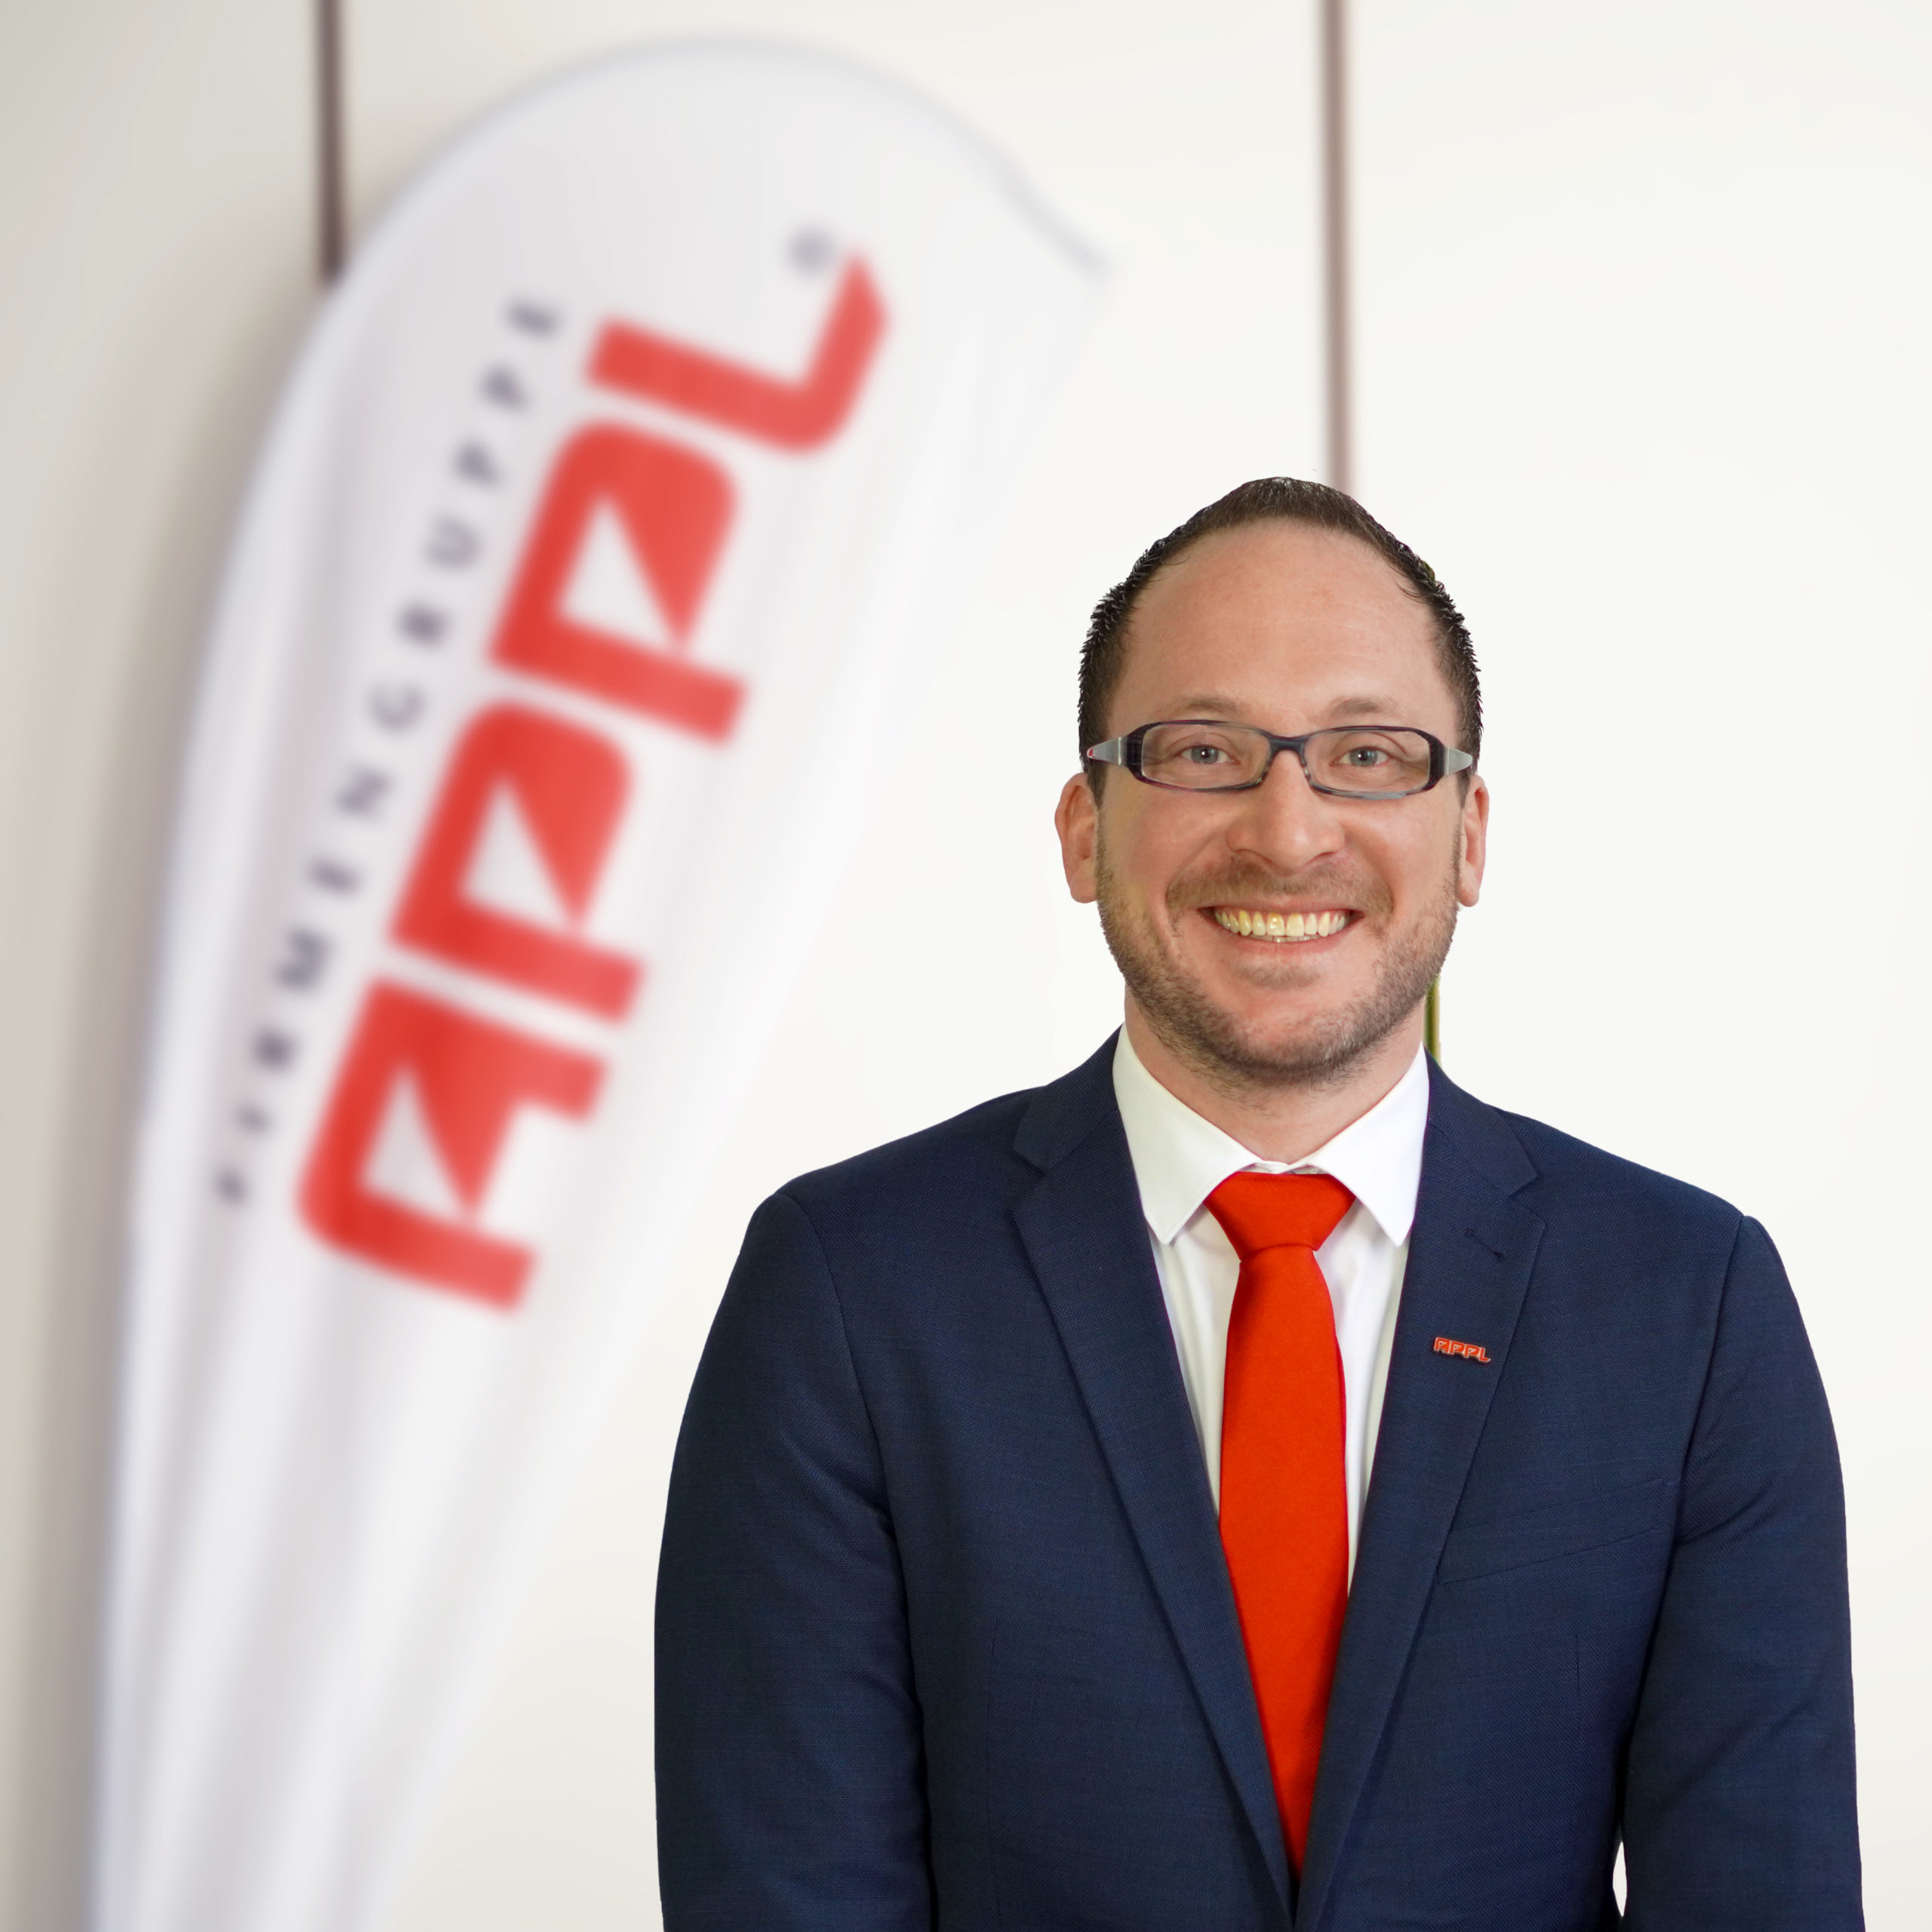 Johann Pfefferer